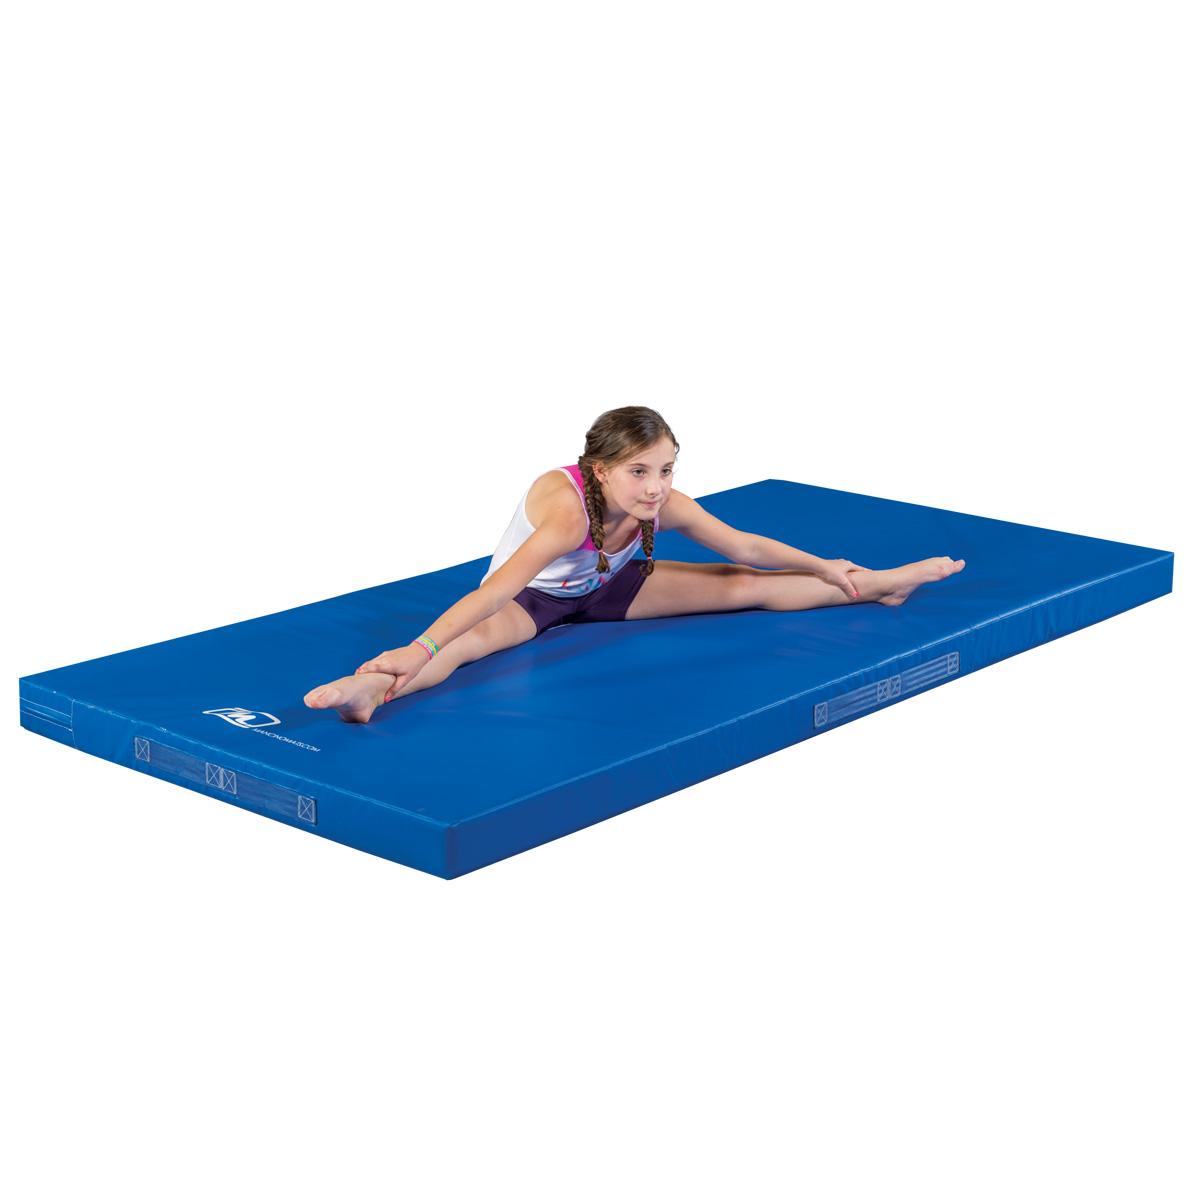 4 incher skill cushion with cheerleader gymnast